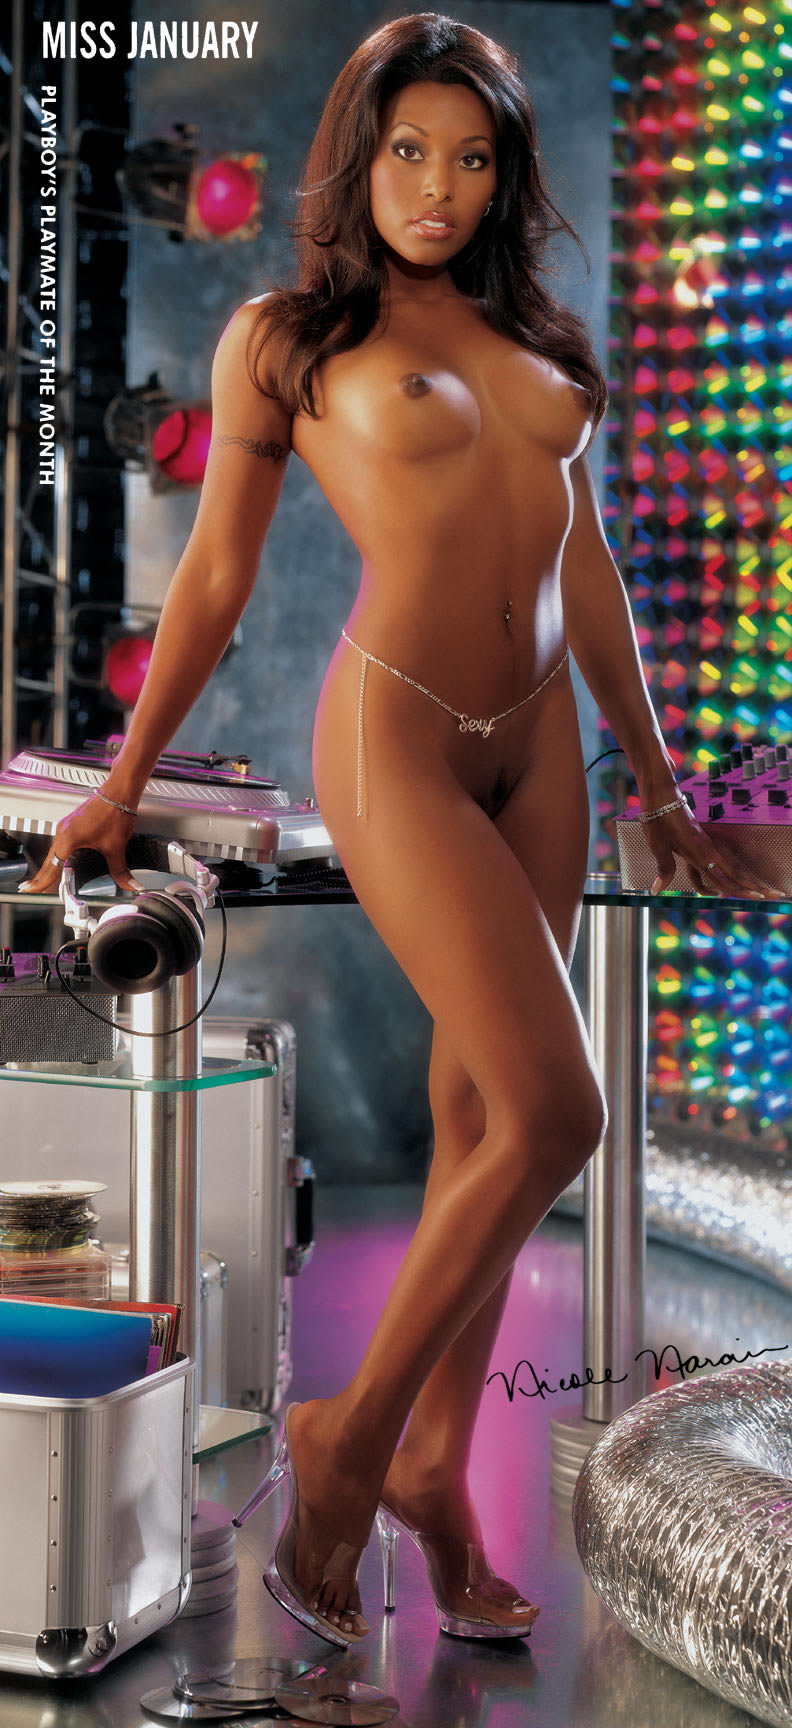 Teri Harrison Naked Good 2002